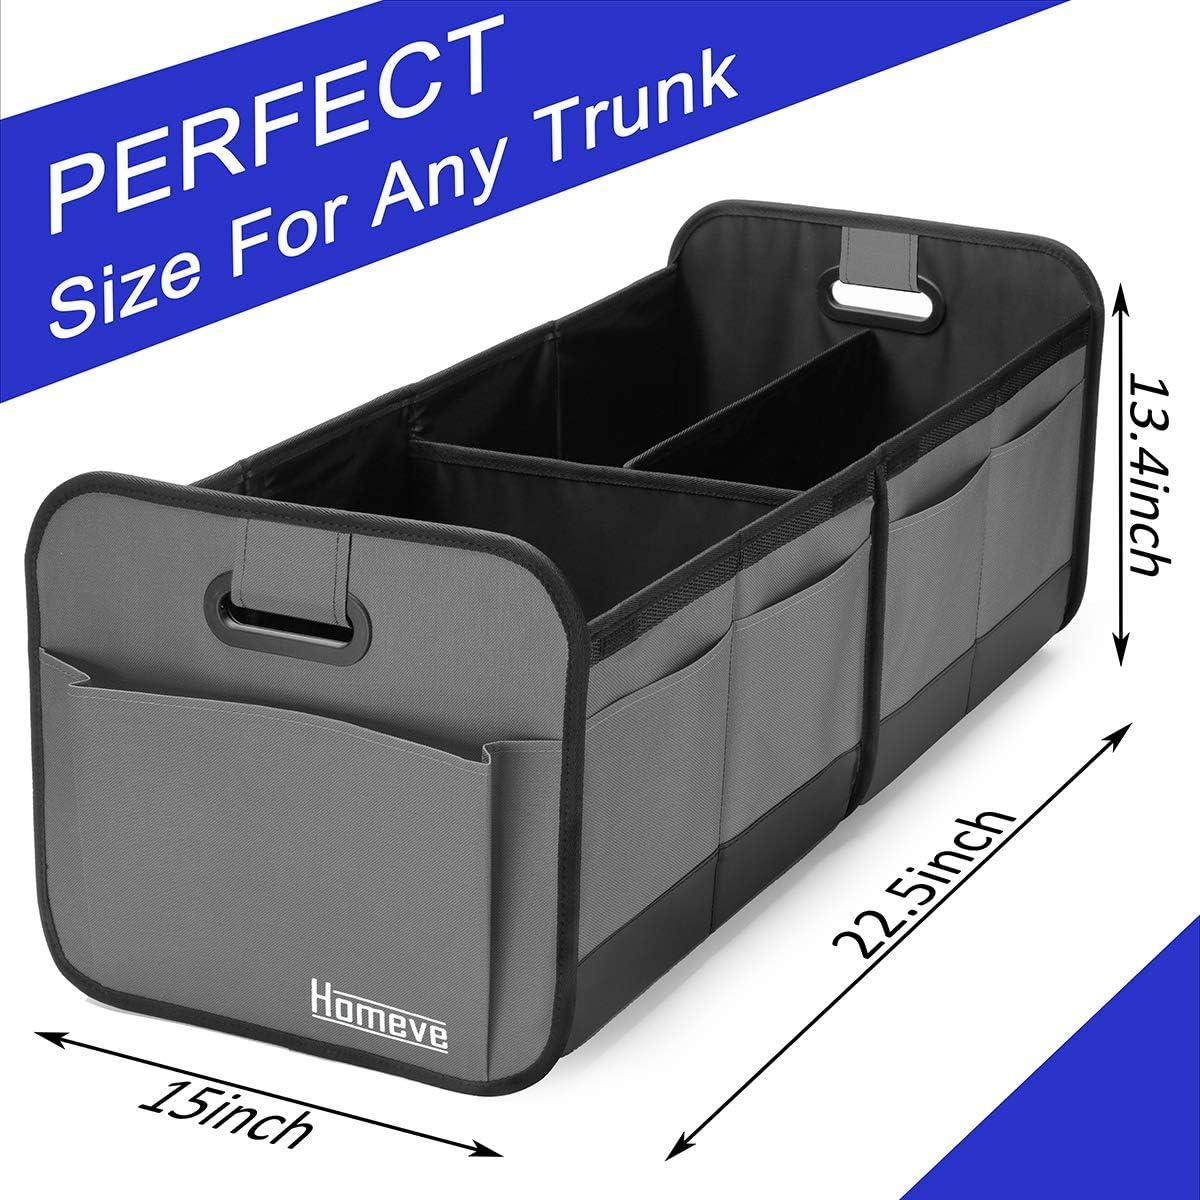 Minivan Reinforced Handles and Great For Car SUV Truck Car Trunk Organiser